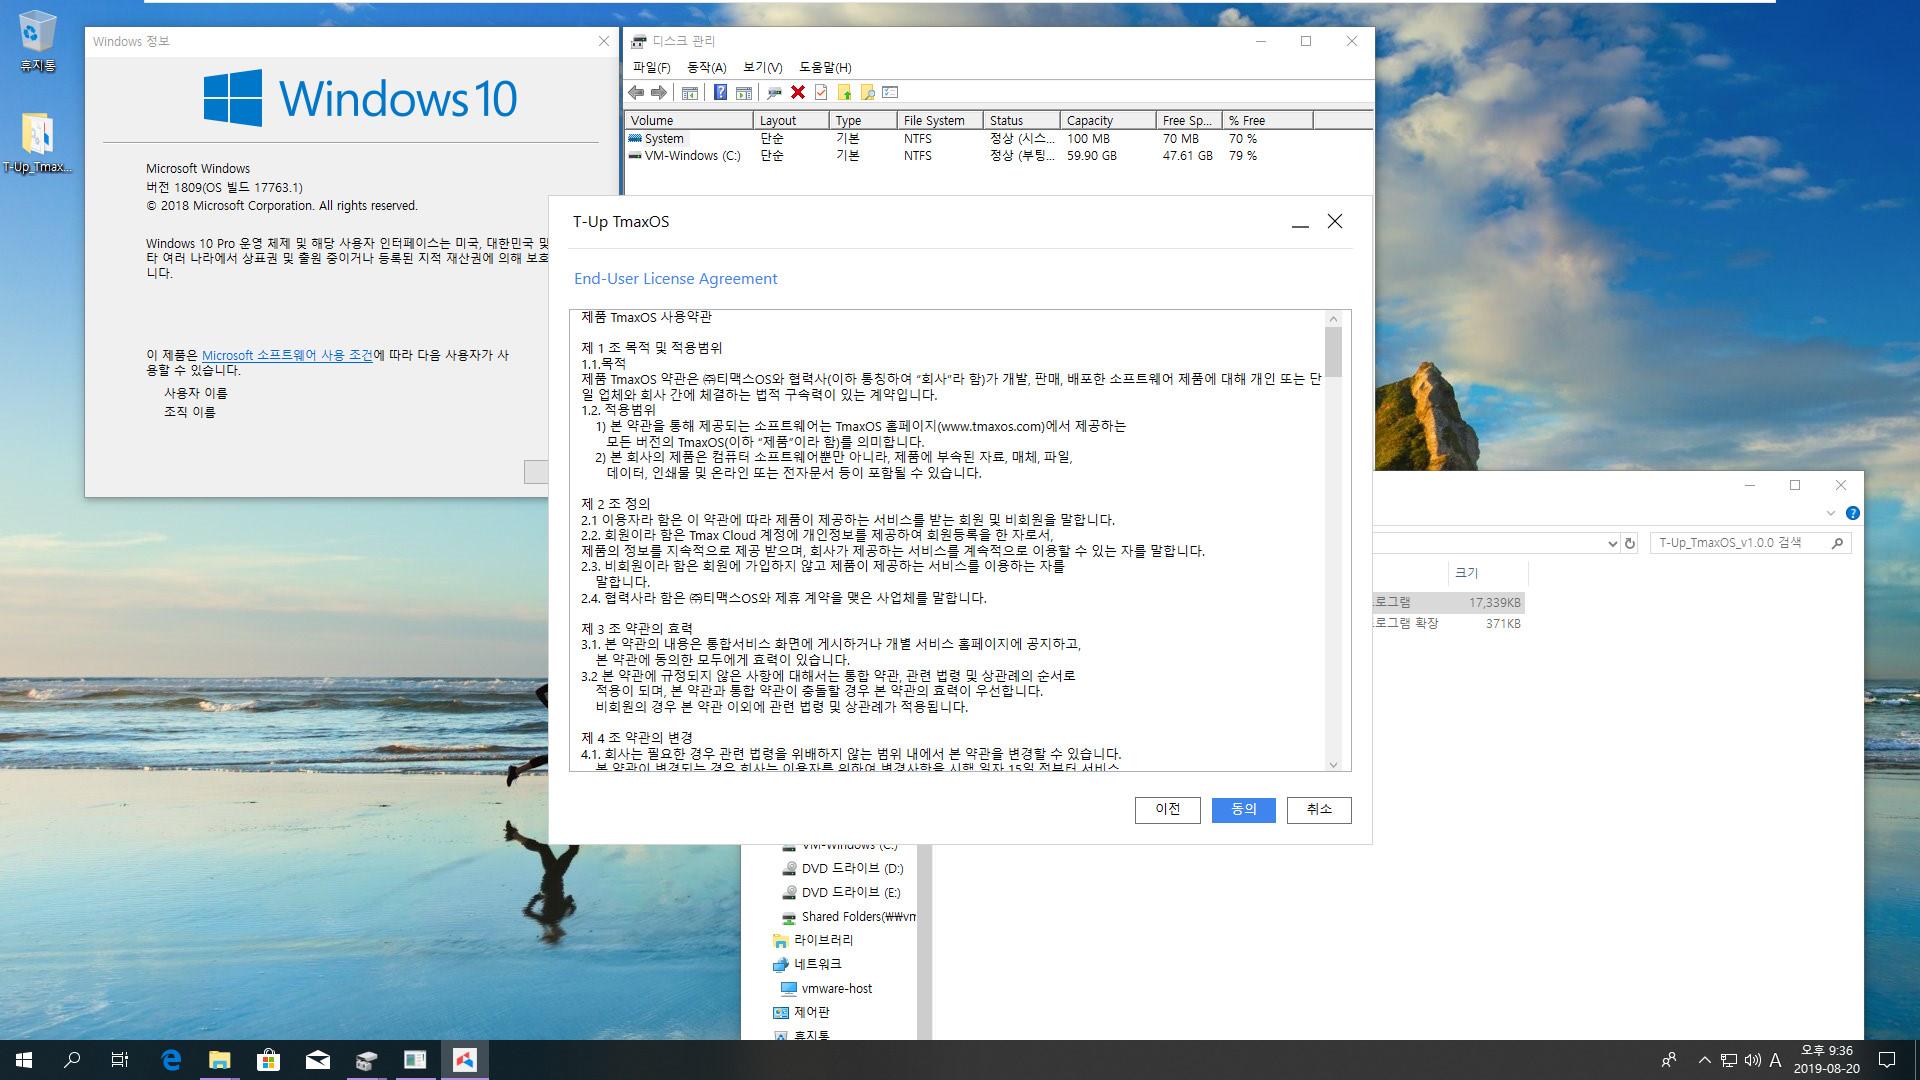 TmaxOS 설치 테스트 - 2번째 시도 - 이번에는 윈도에서 Tmax에서 제공한 T-Up TmaxOS.exe 으로 멀티 부팅으로 설치하기 2019-08-20_213638.jpg